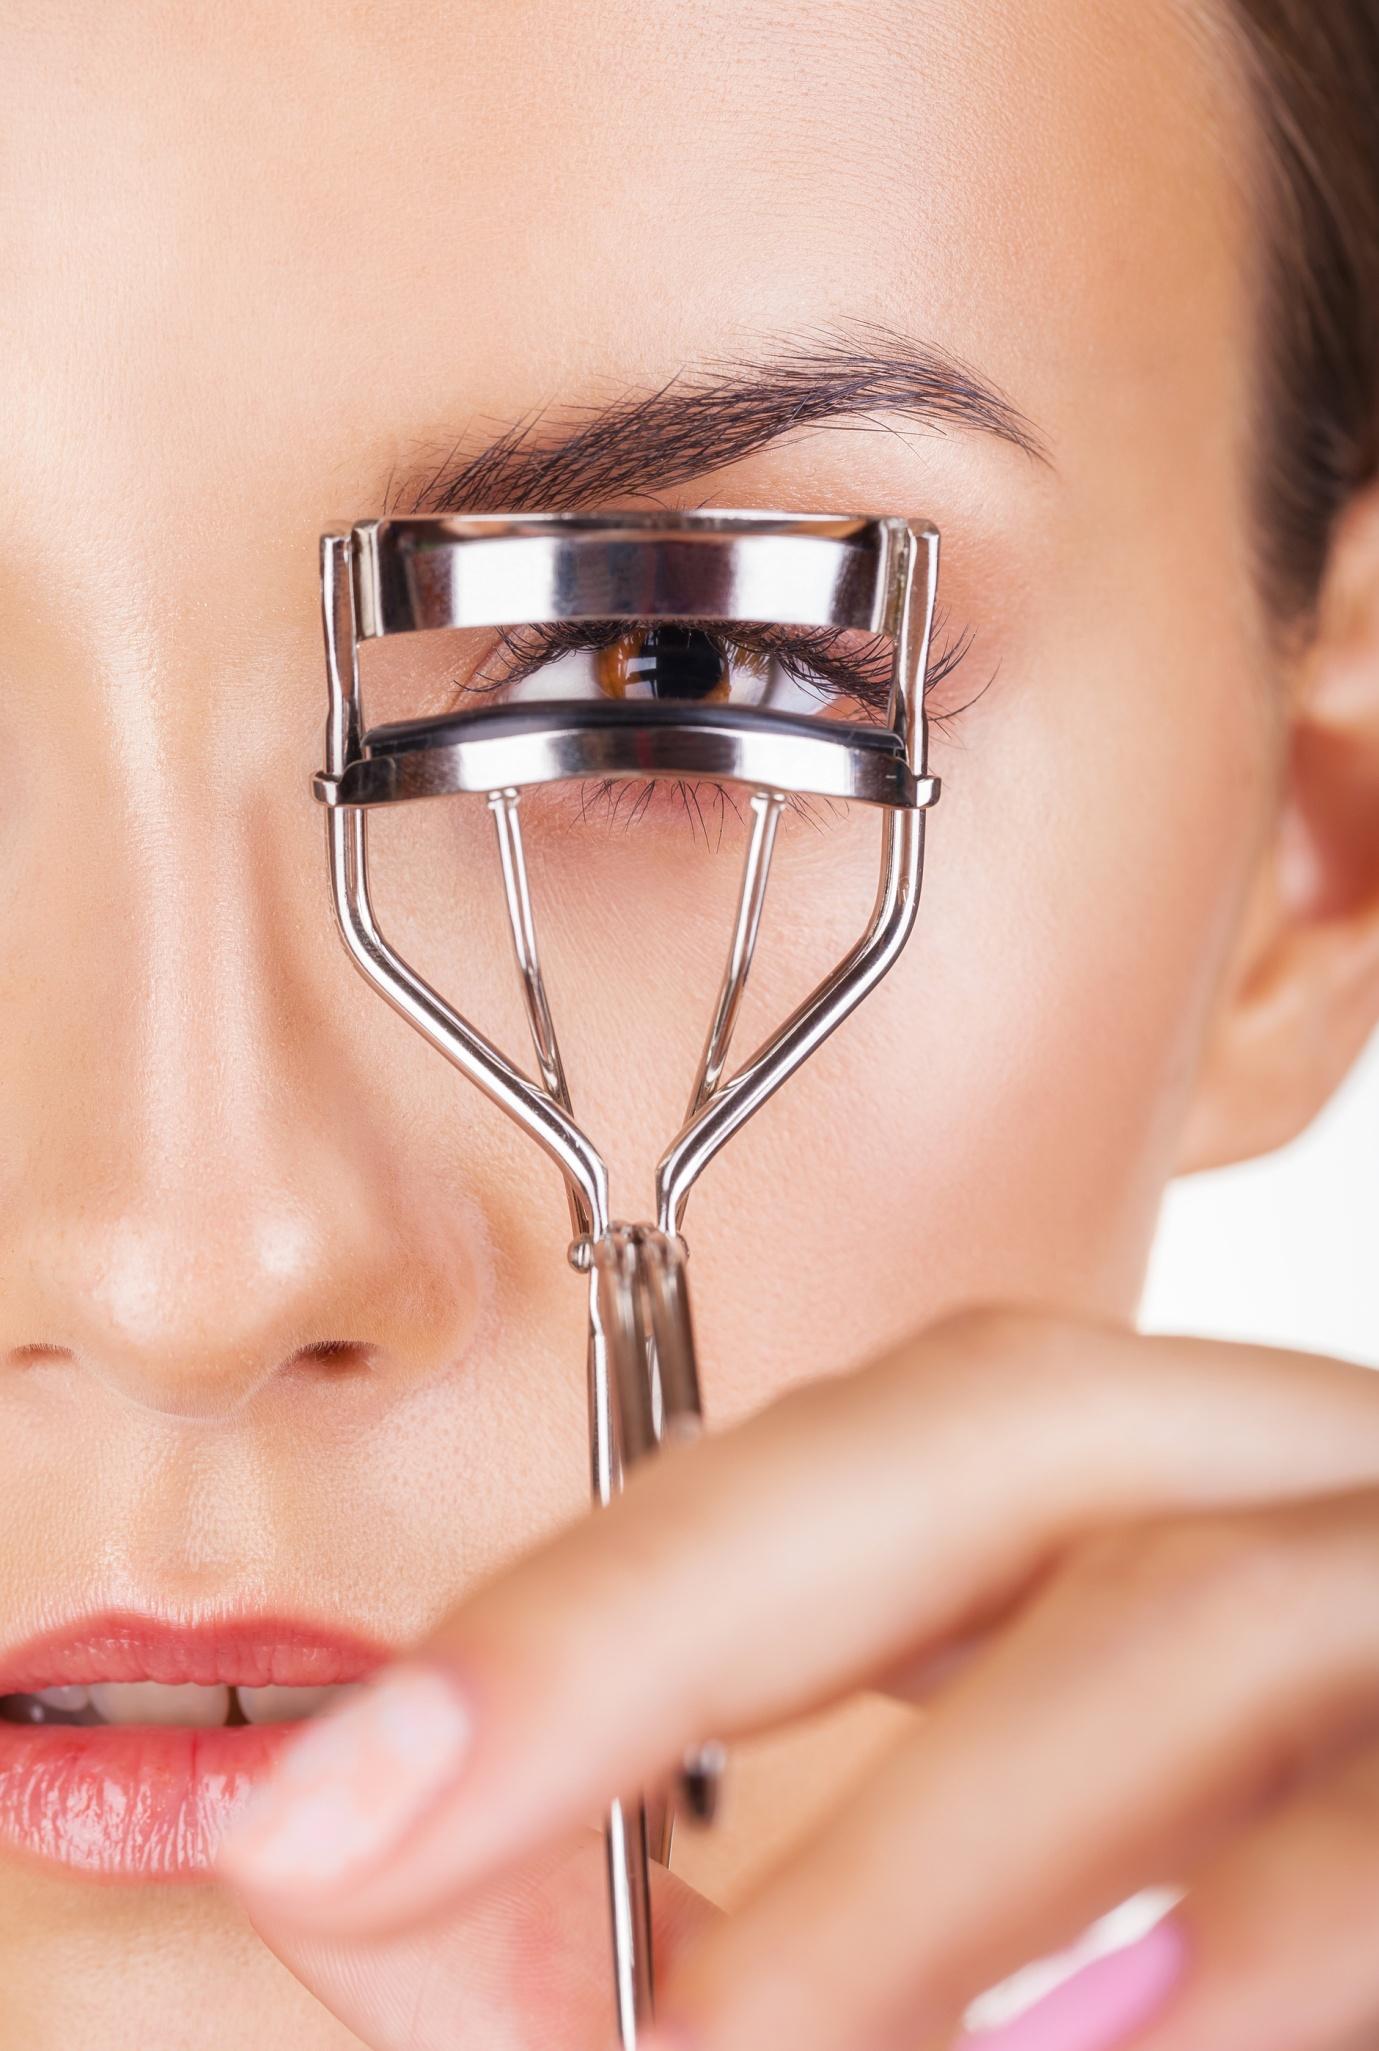 Choose the Best Eyelash Curler: Mechanical or Heated